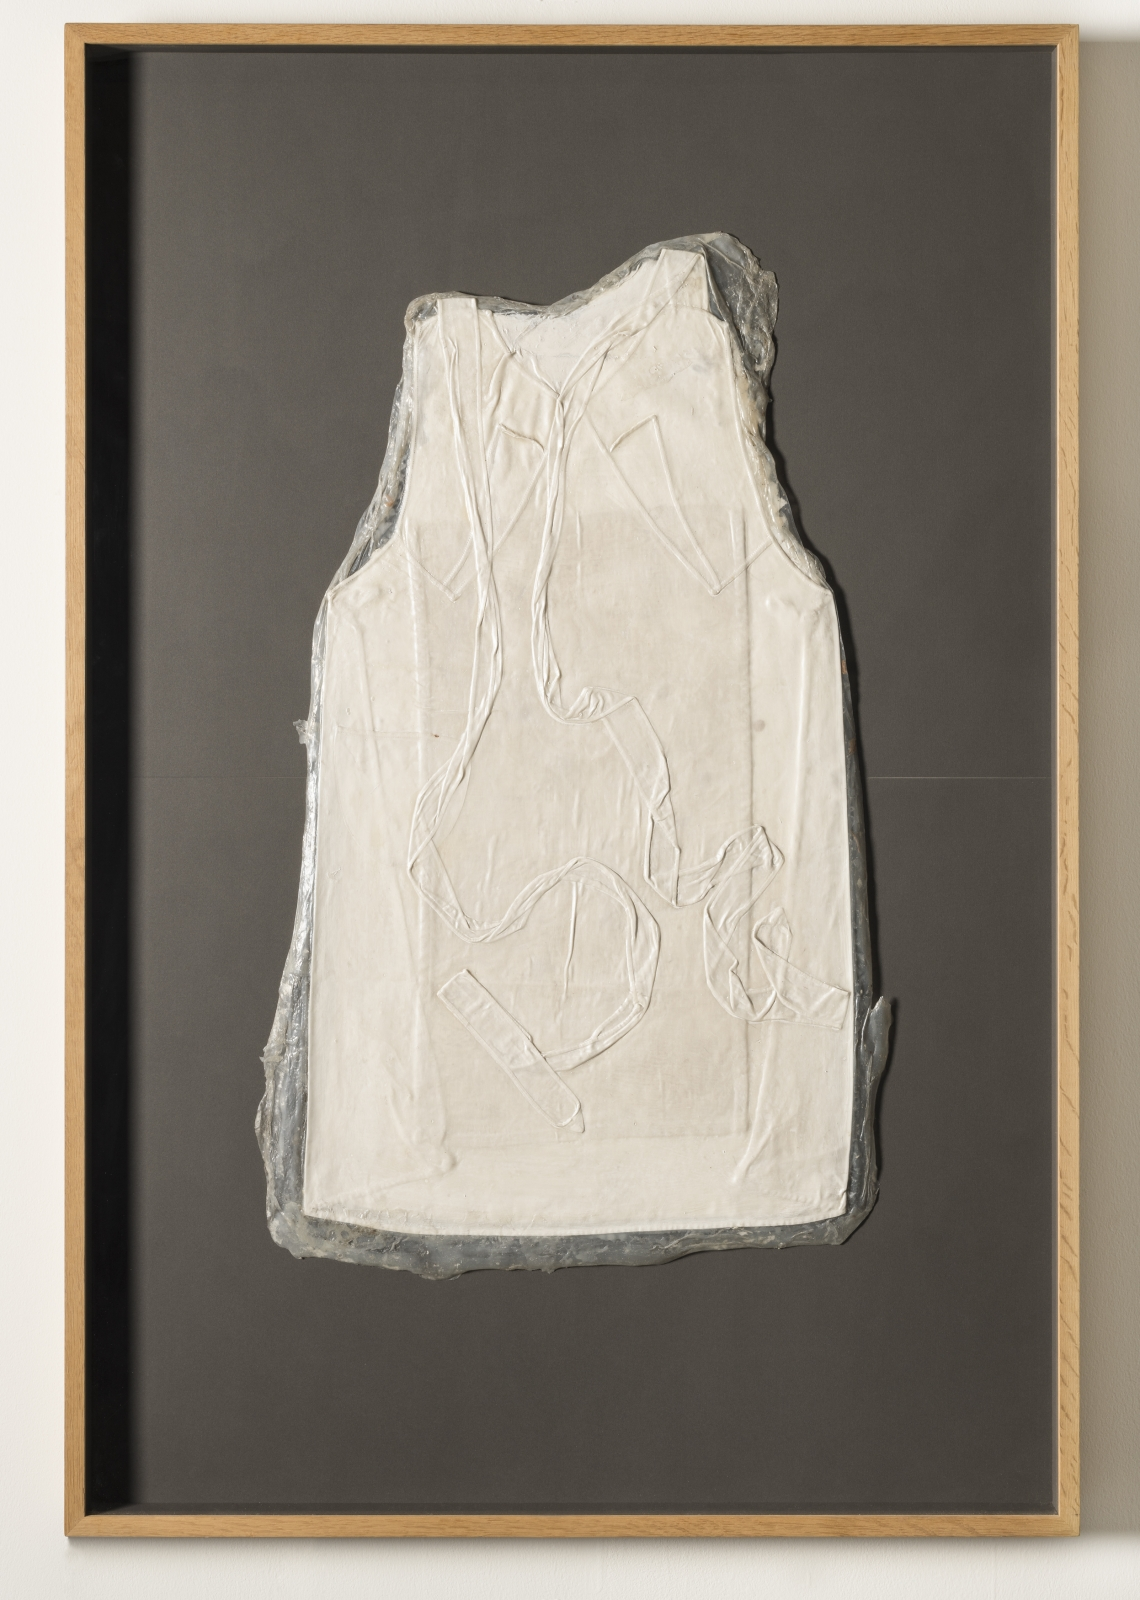 HEIDI BUCHER Untitled (Kuchenschurze / White Apron), ca. 1975